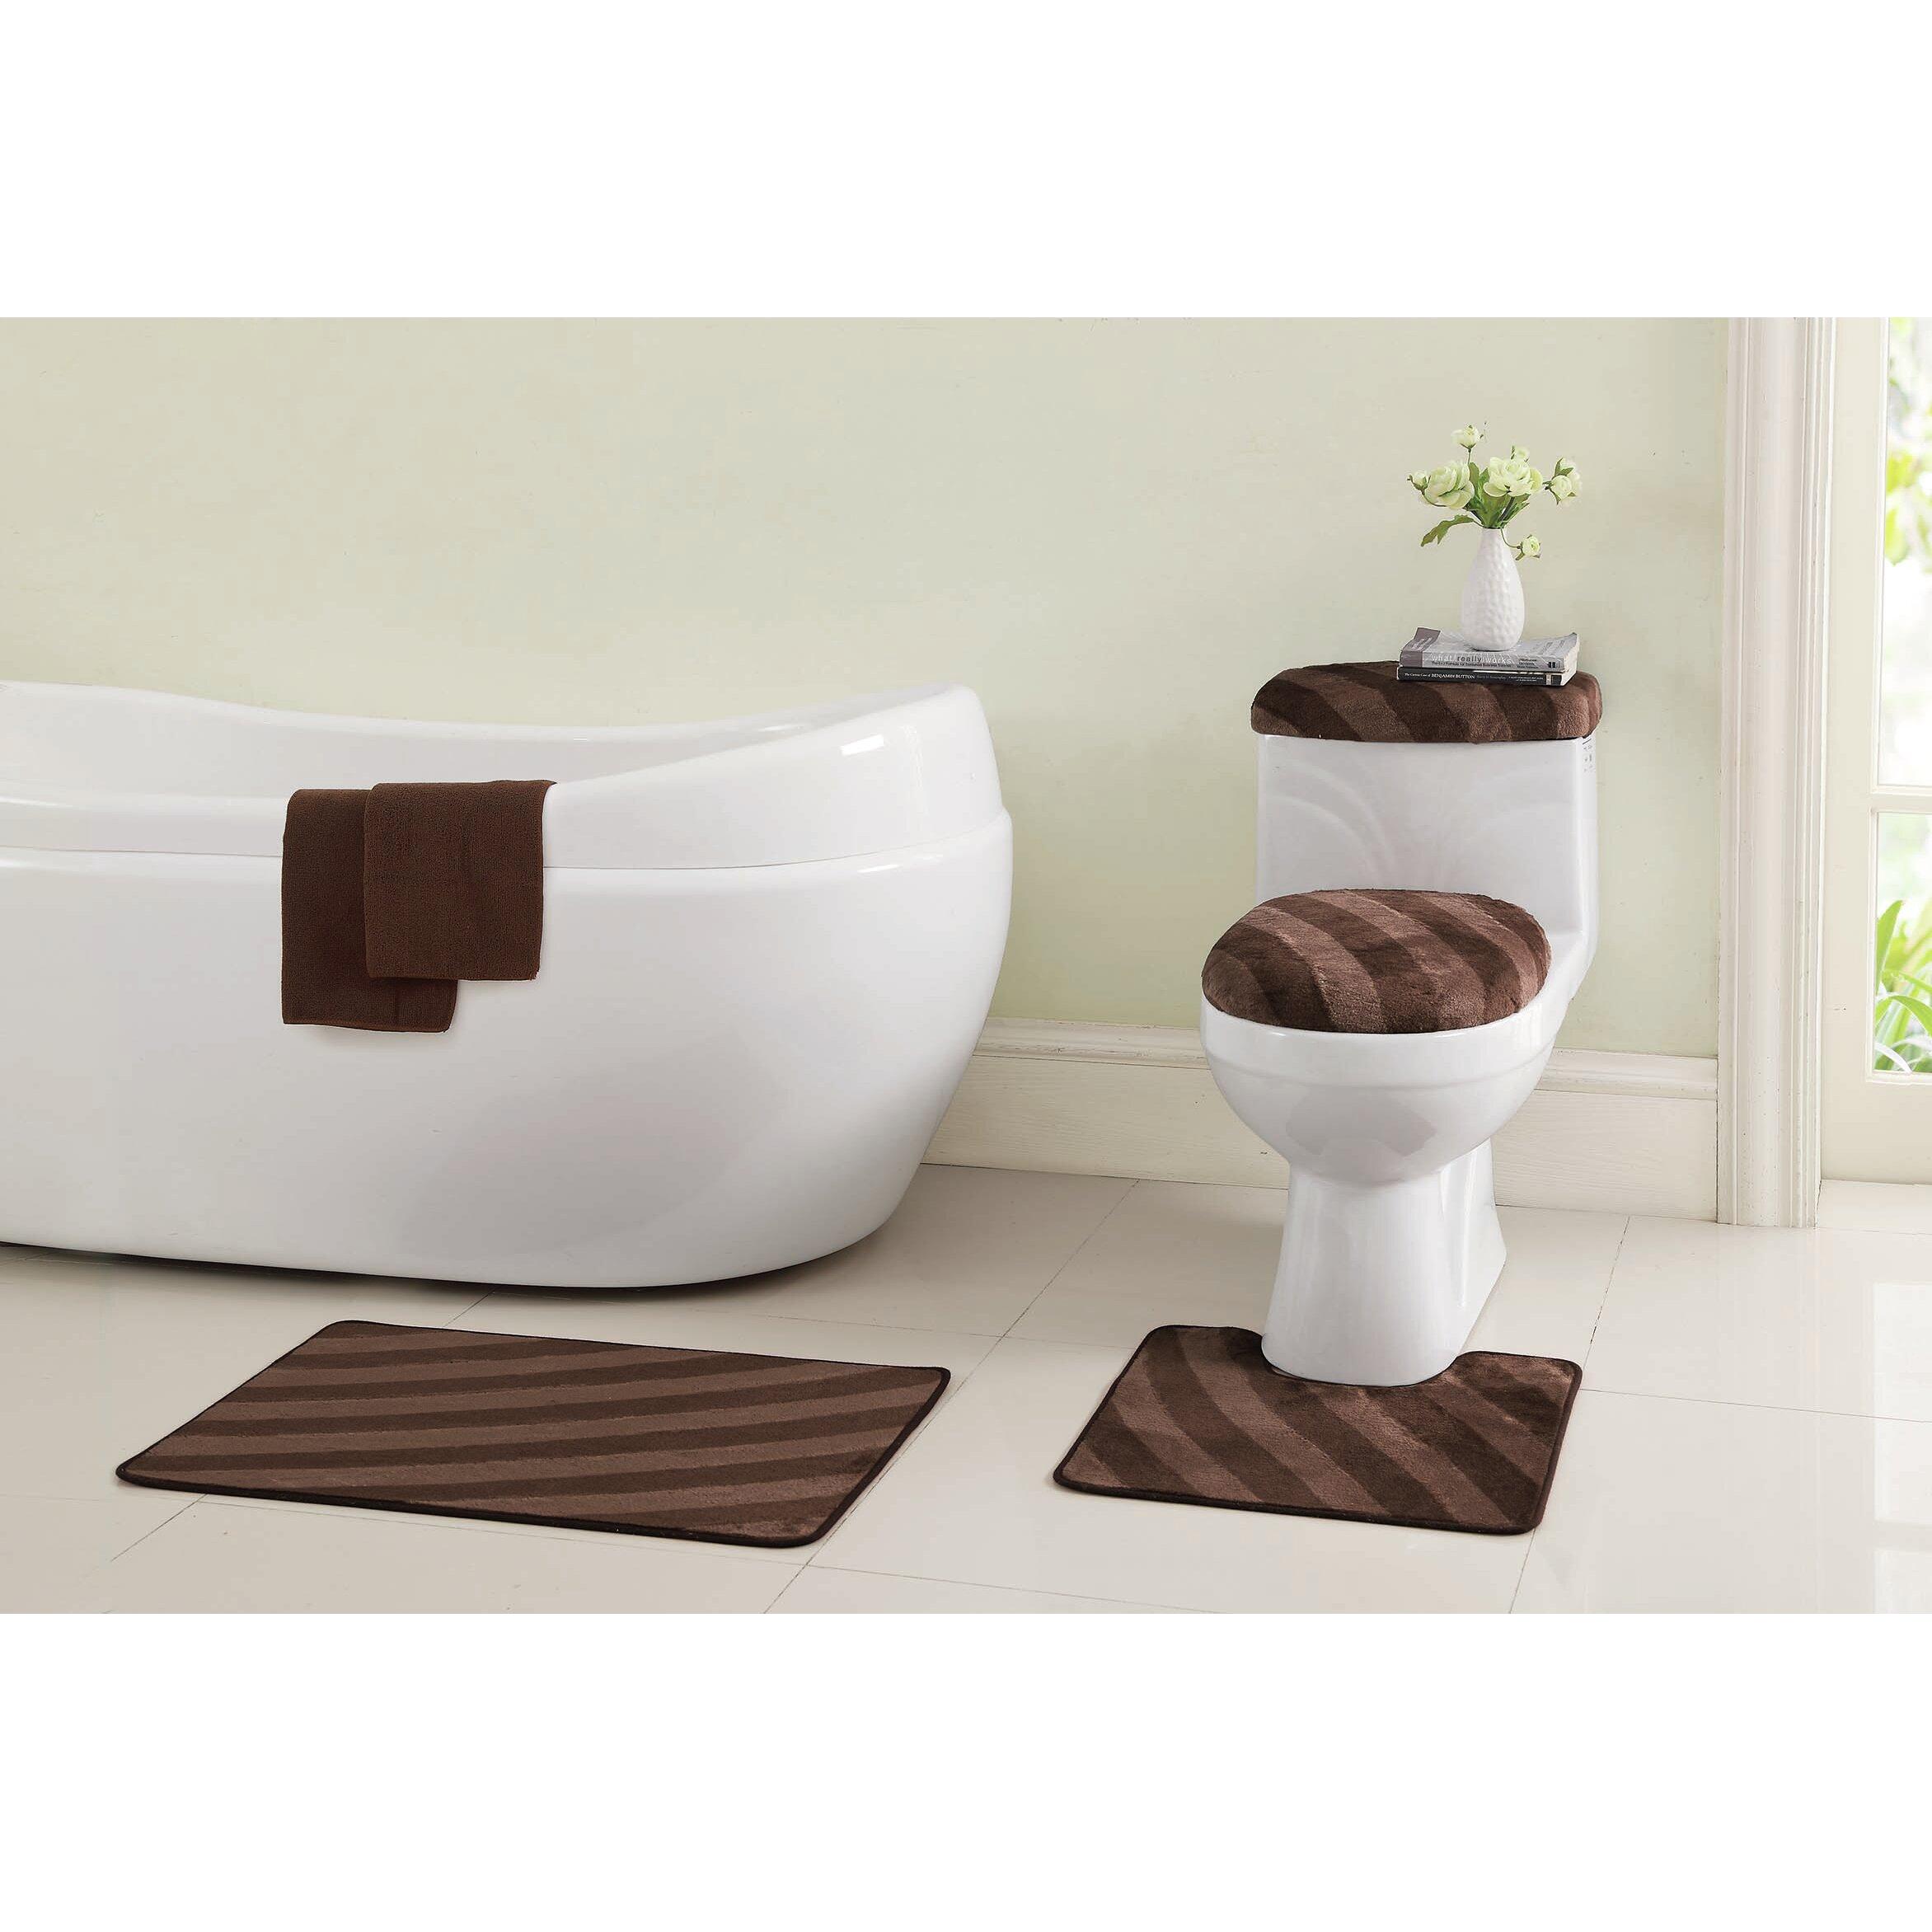 Bathroom Rugs Set Vcny Addie 12 Piece Bath Rug Set Reviews Wayfair